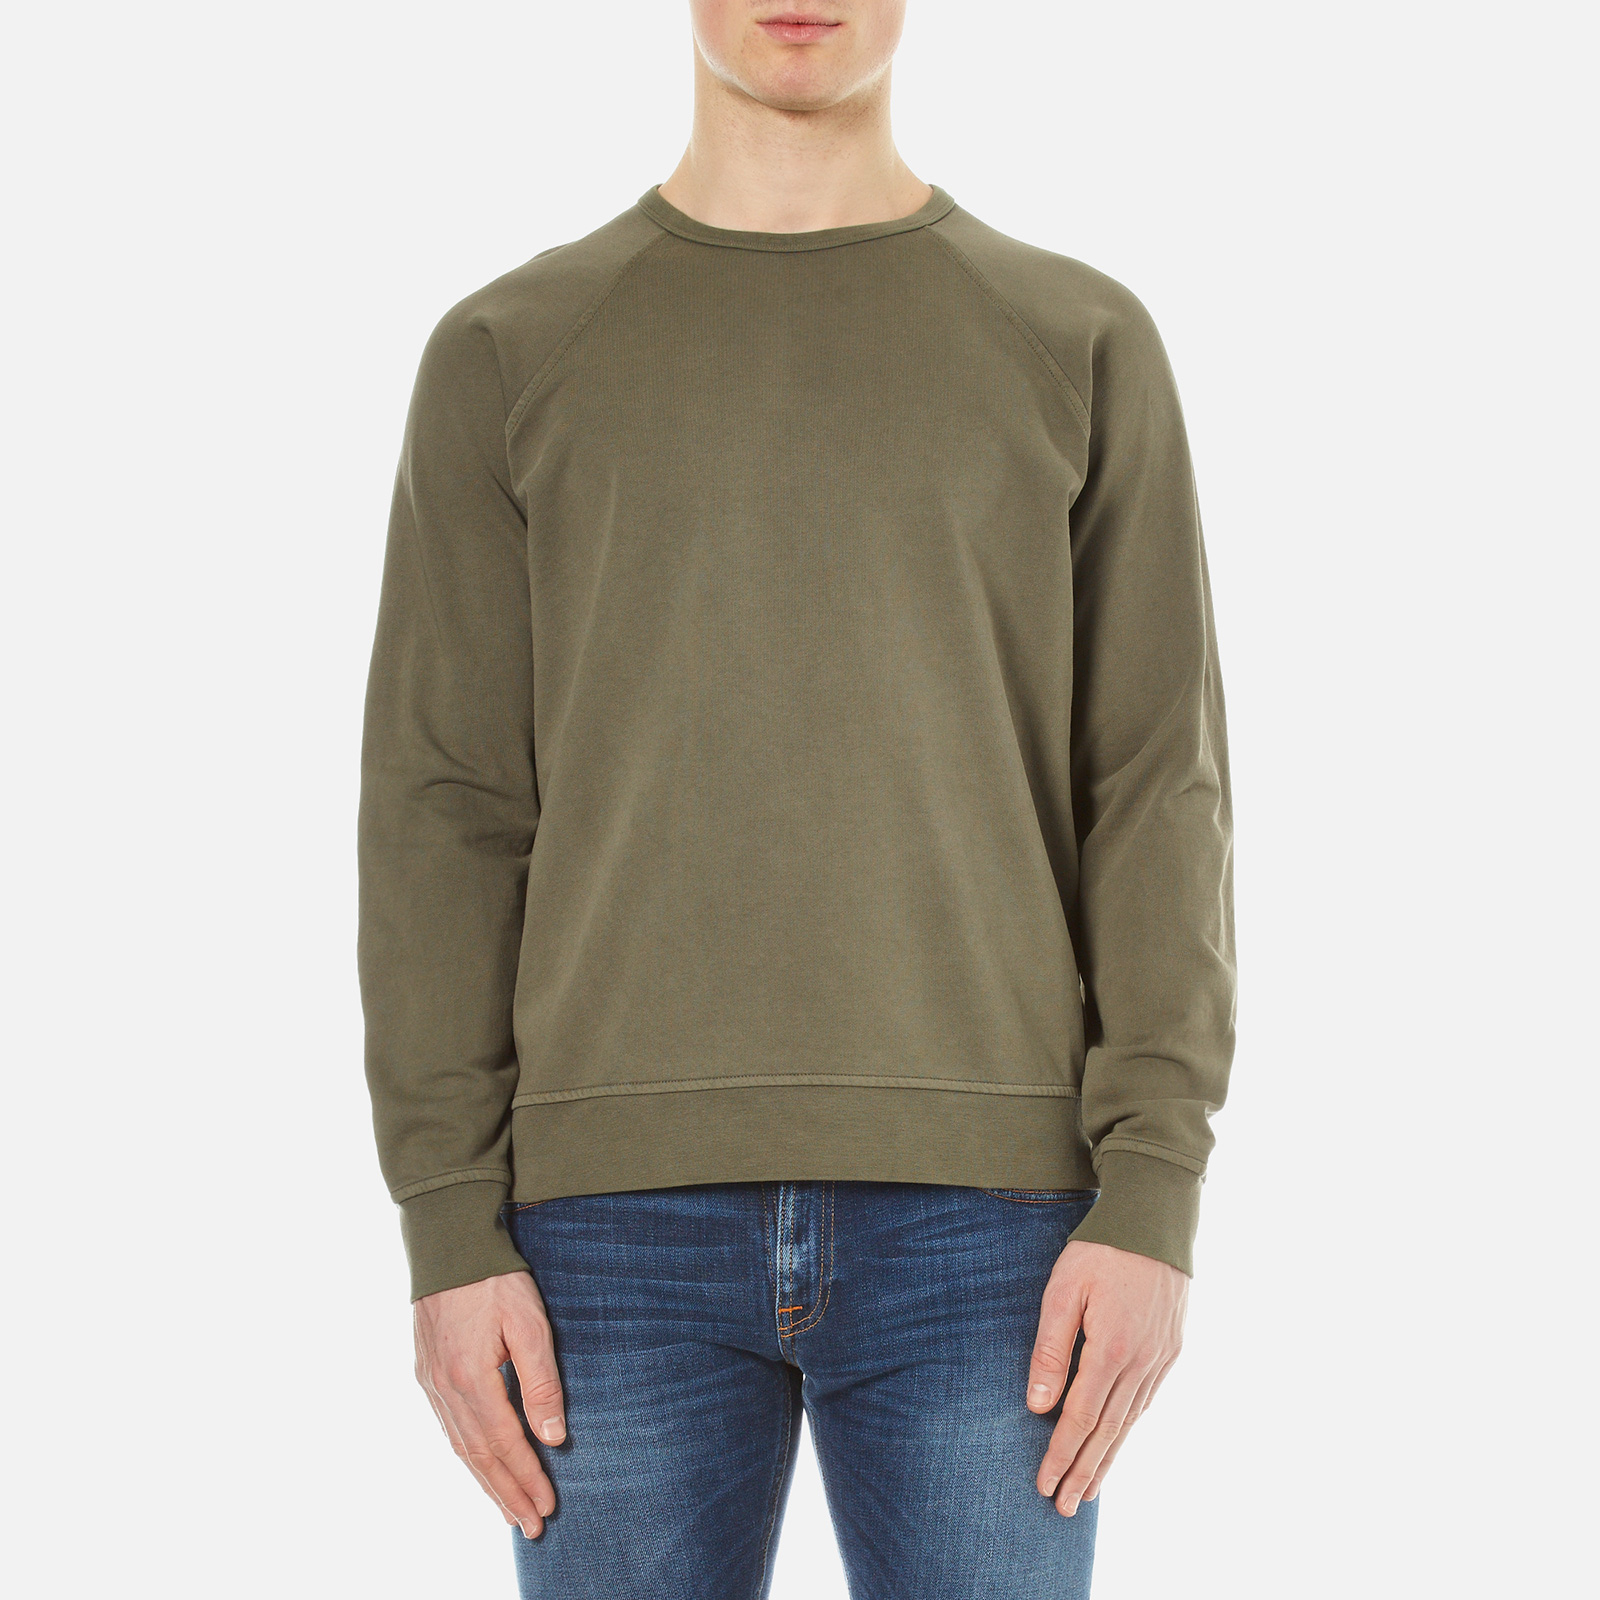 Ymc black t shirt - Ymc Men S Almost Grown Sweatshirt Olive